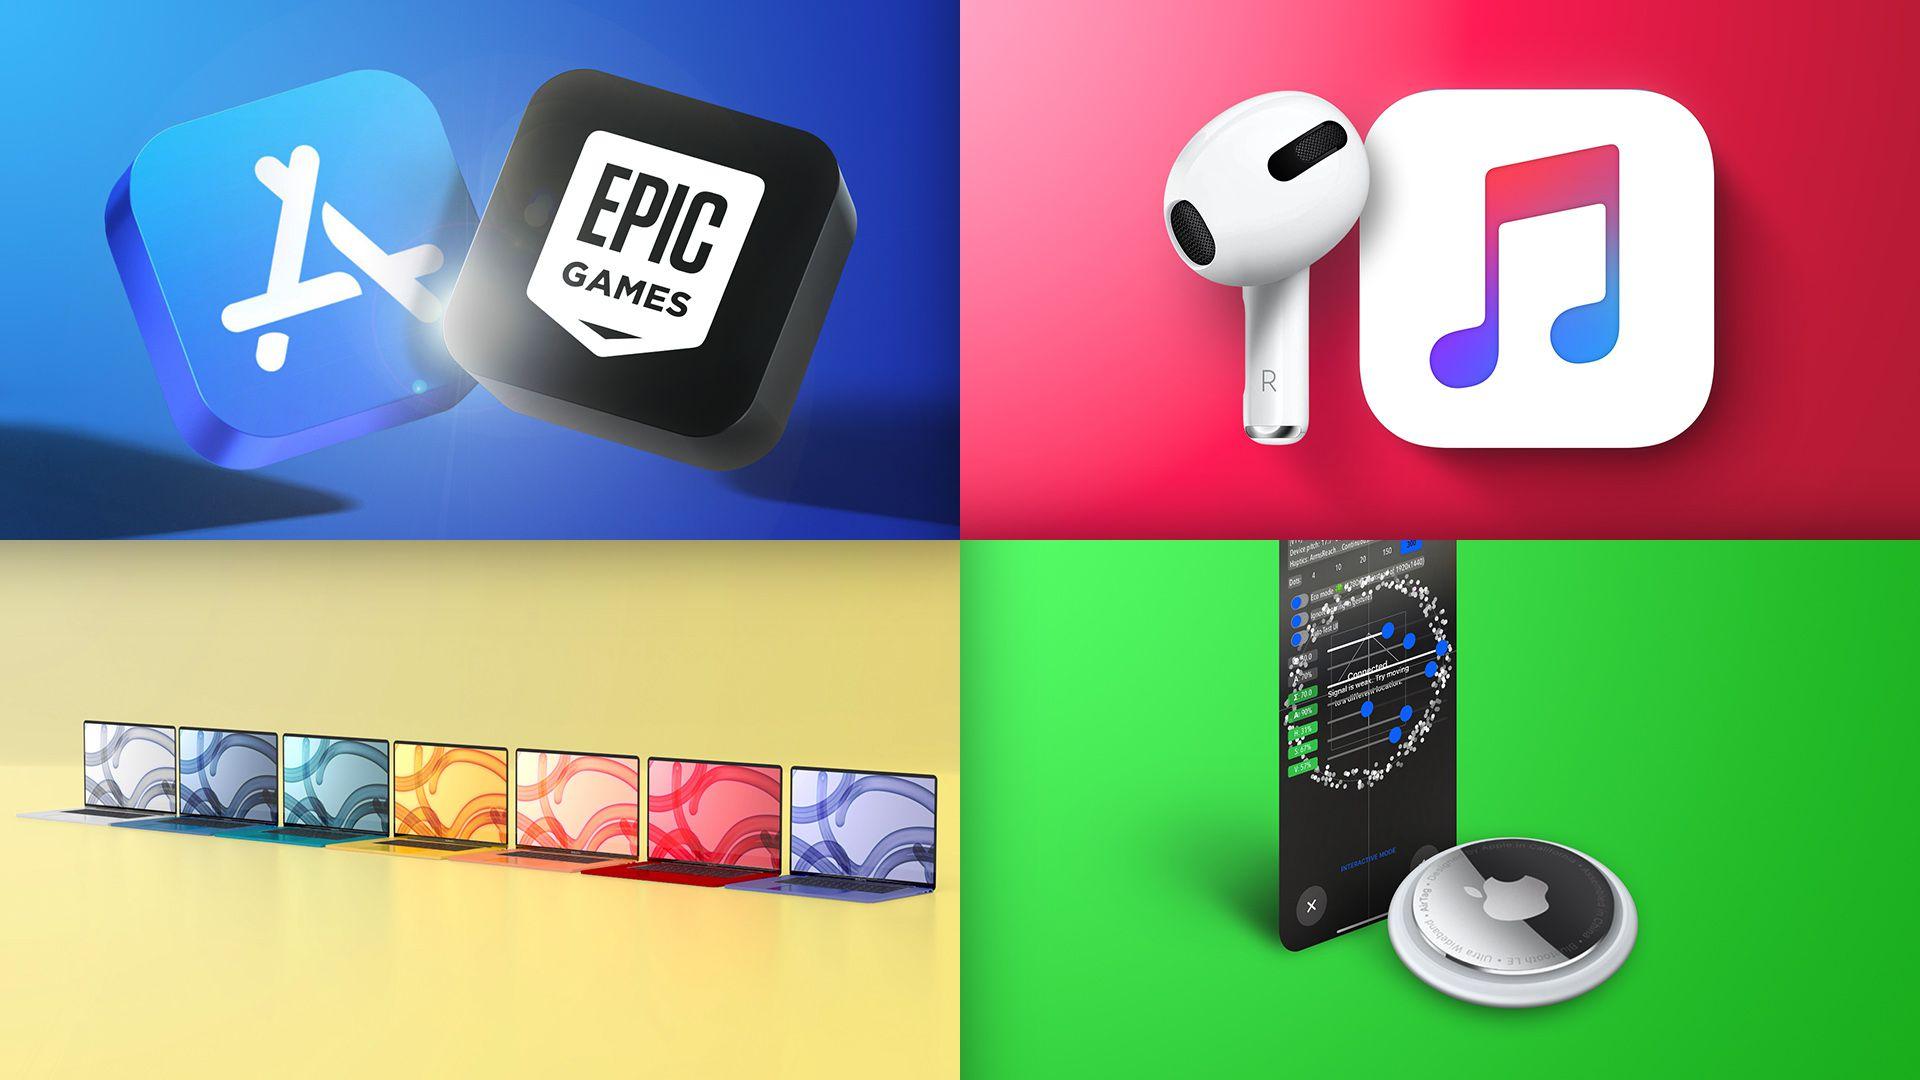 Top Stories: Epic Games vs. Apple, Hidden AirTag Mode, Apple Music Hi-Fi, Colorful MacBook Air?